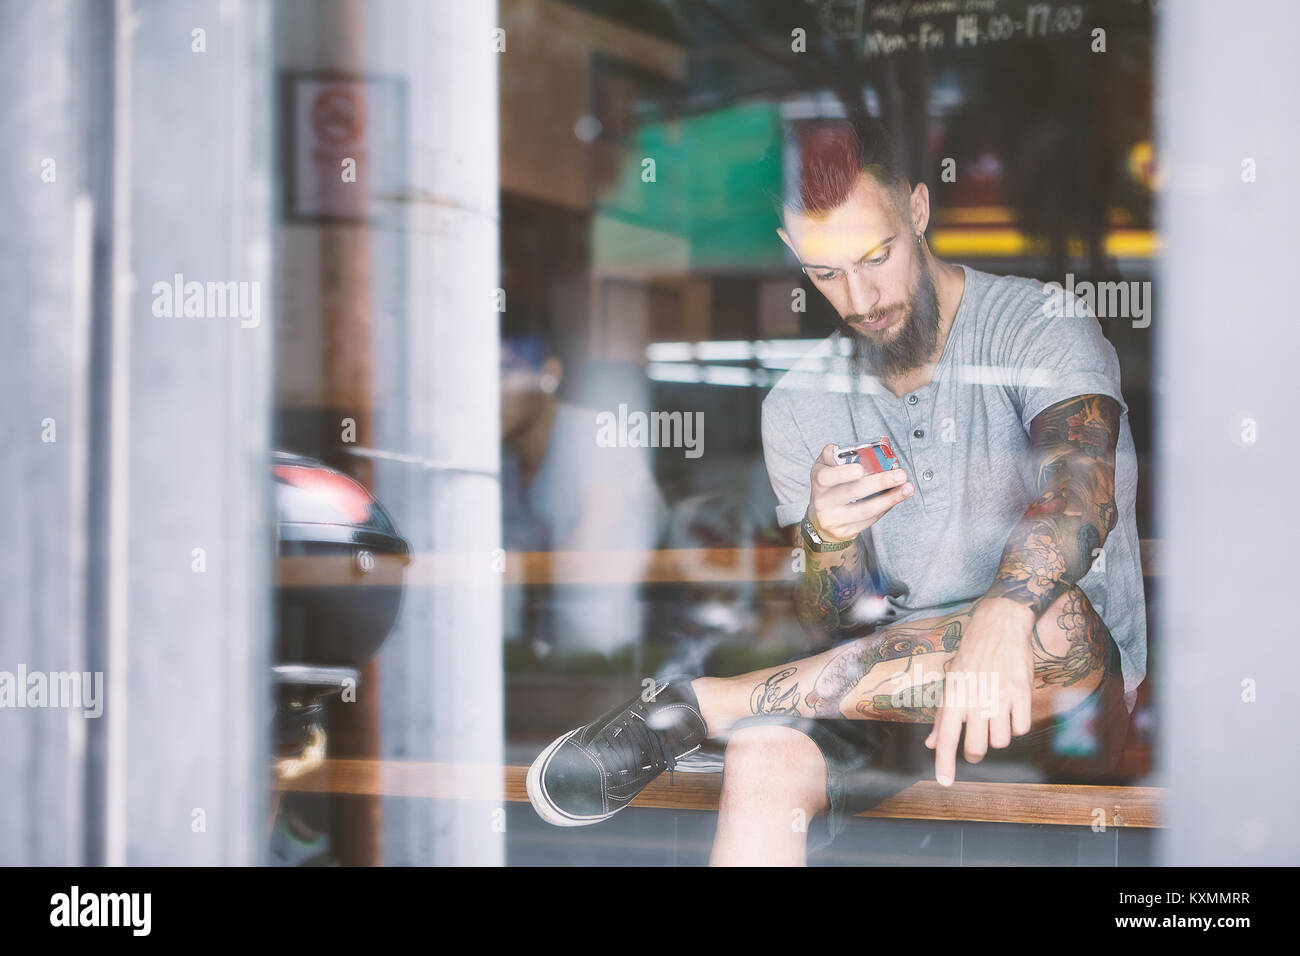 Junge männliche Hipster in Fenster Cafe Sitz am Smartphone, Shanghai French Concession, Shanghai, China Stockbild